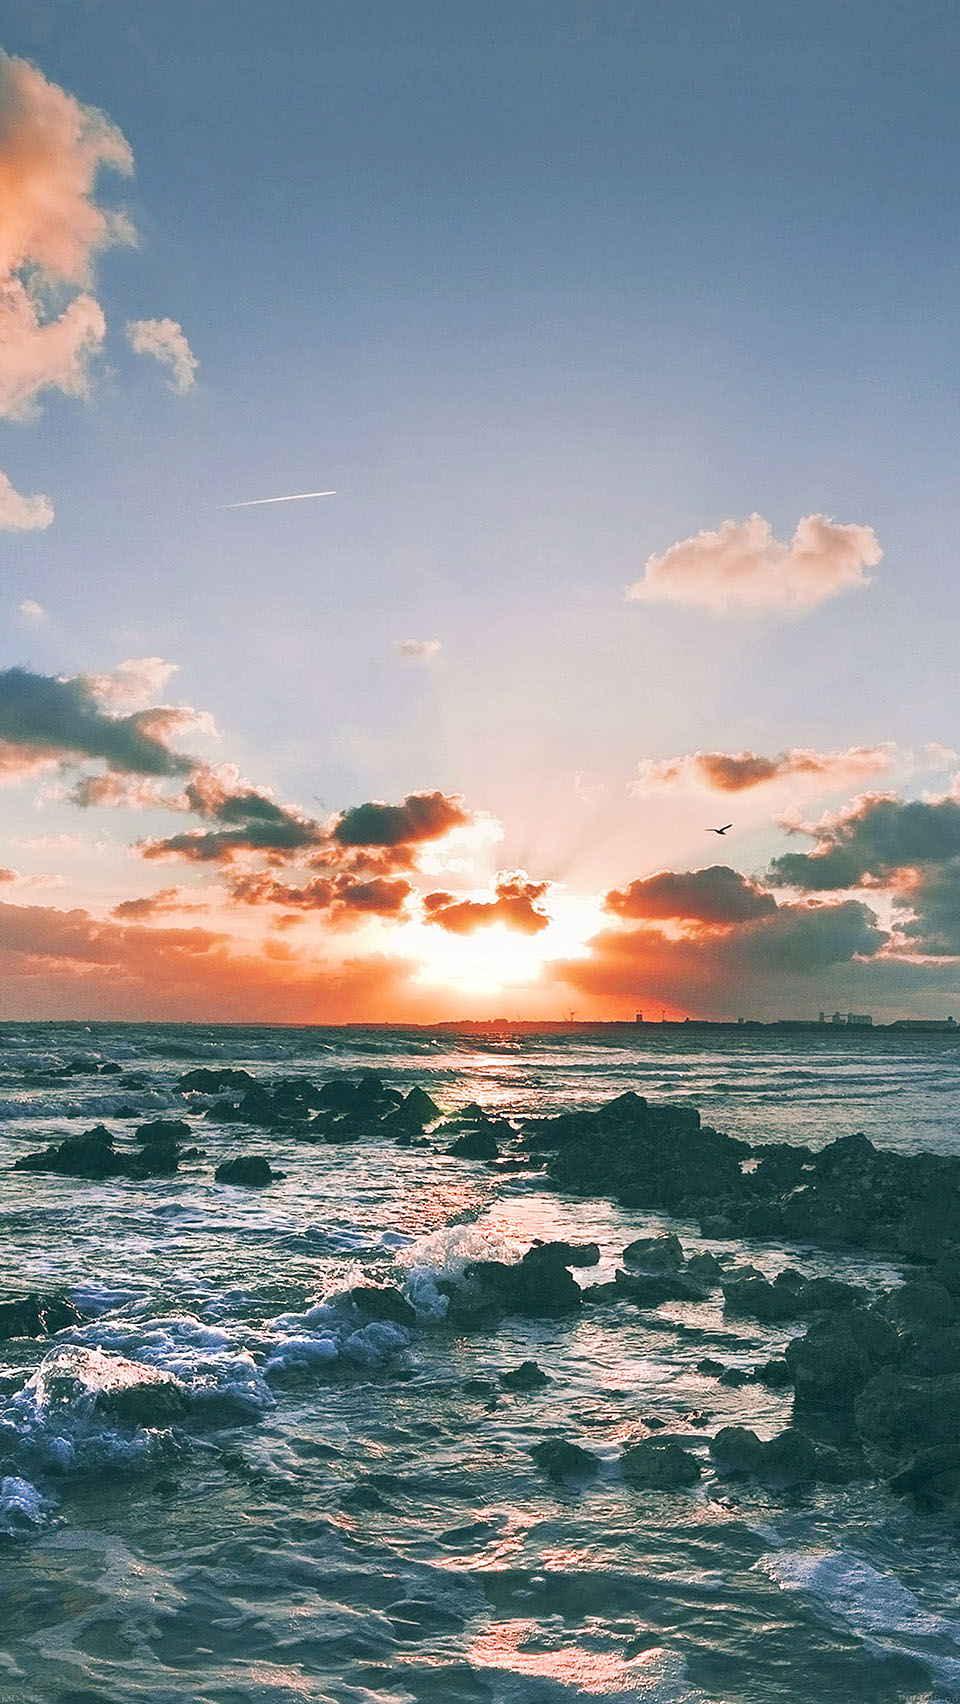 Ocean Sunset Wallpaper iPhone 6 preview 960x1704